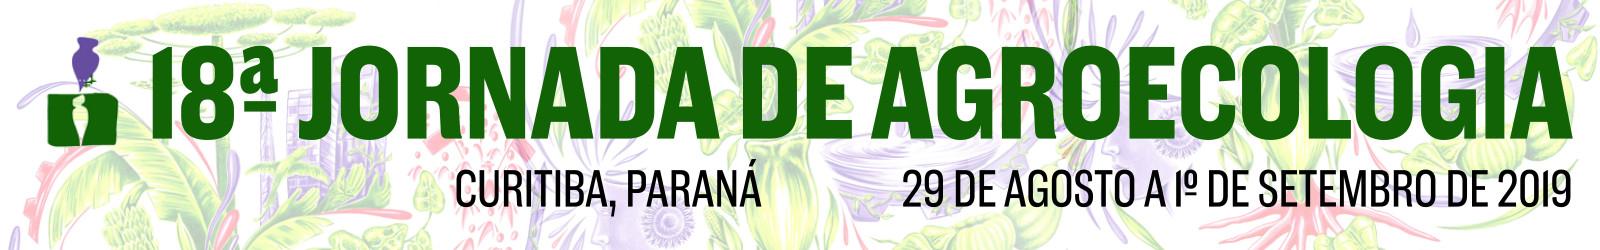 18ª Jornada de Agroecologia